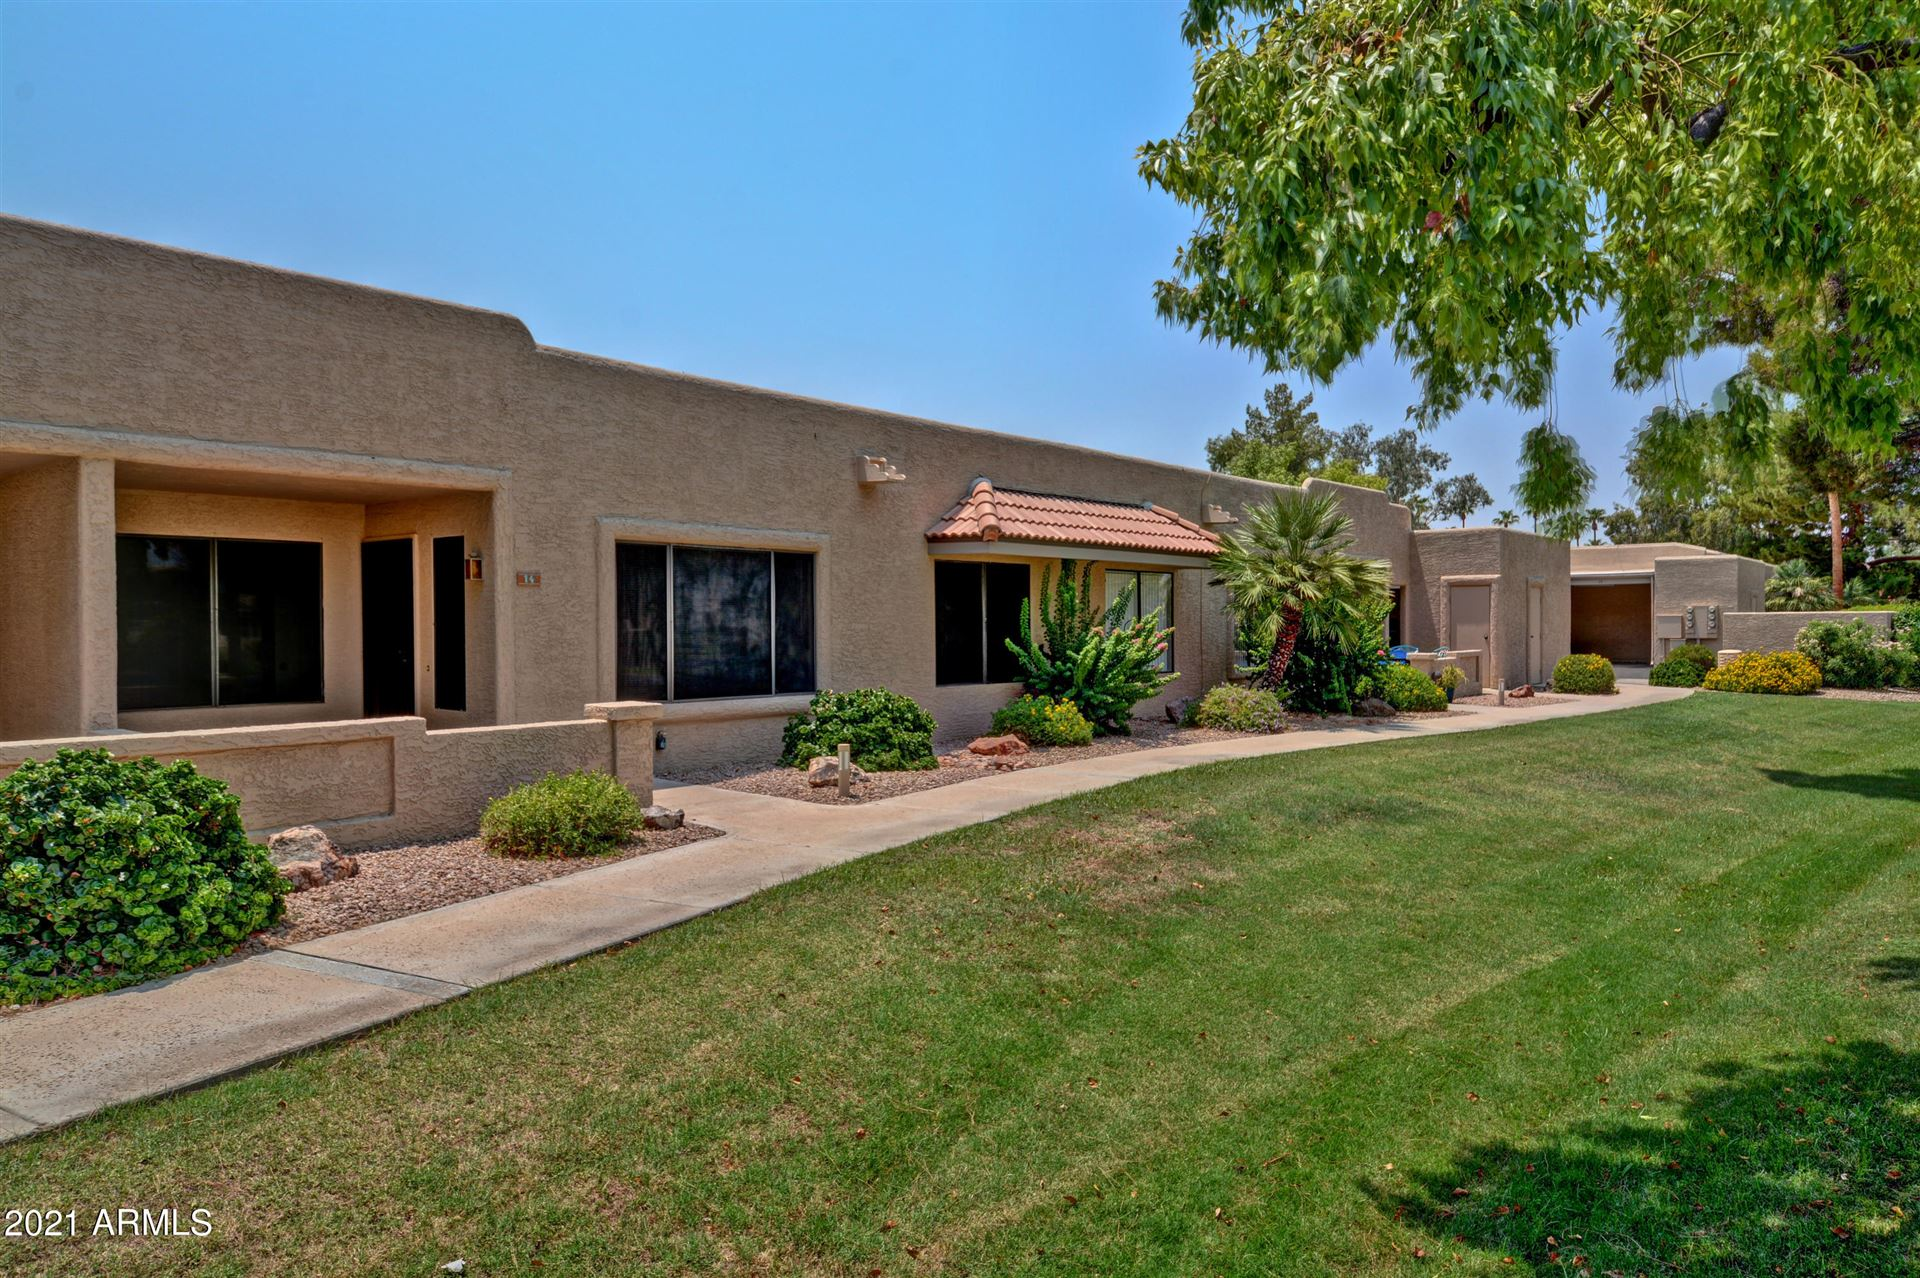 Photo of 14300 W BELL Road #14, Surprise, AZ 85374 (MLS # 6268816)